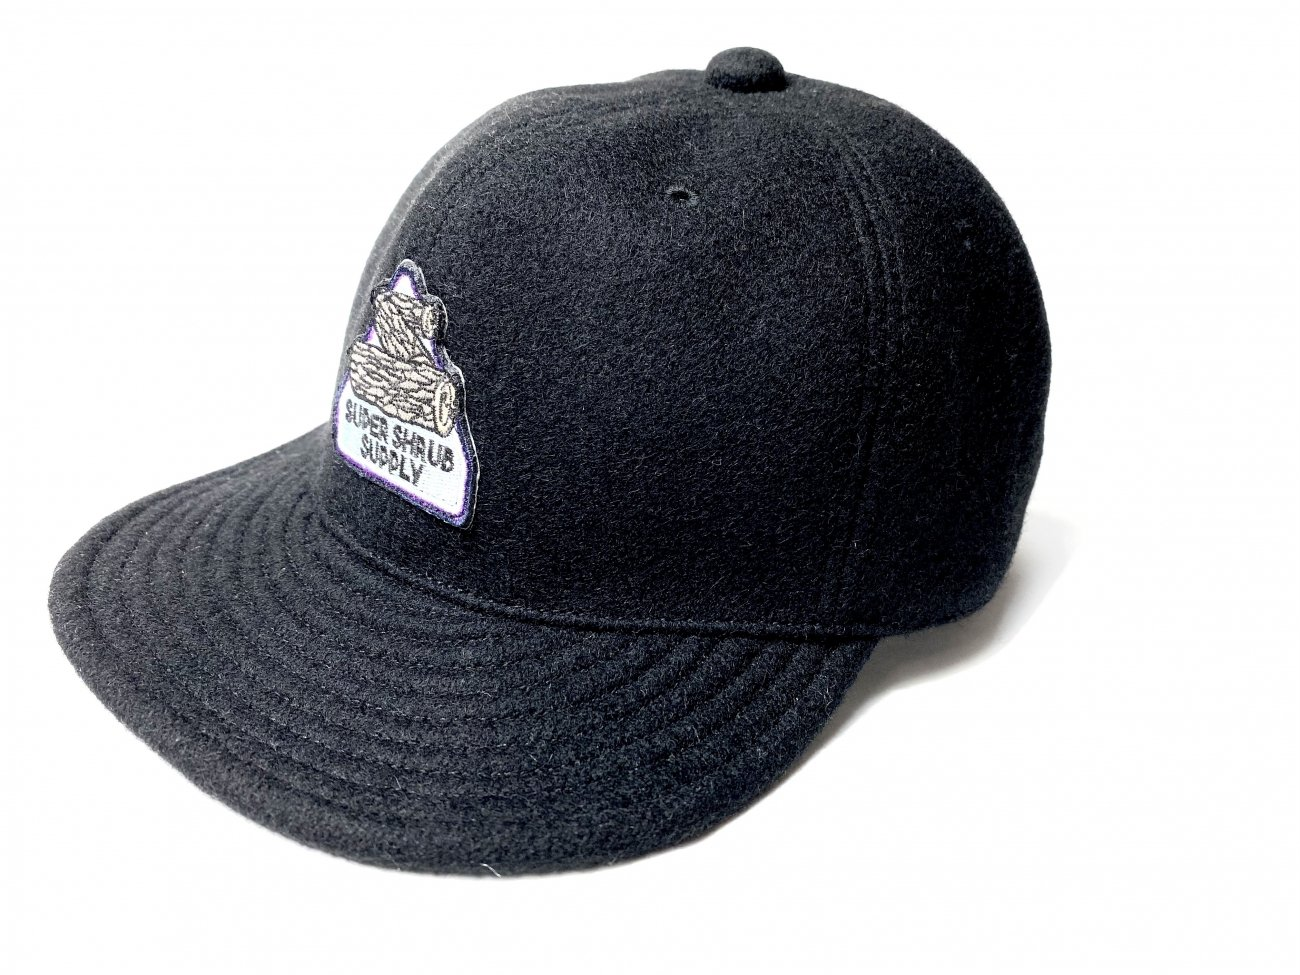 Wood SS Logo Wool Cap